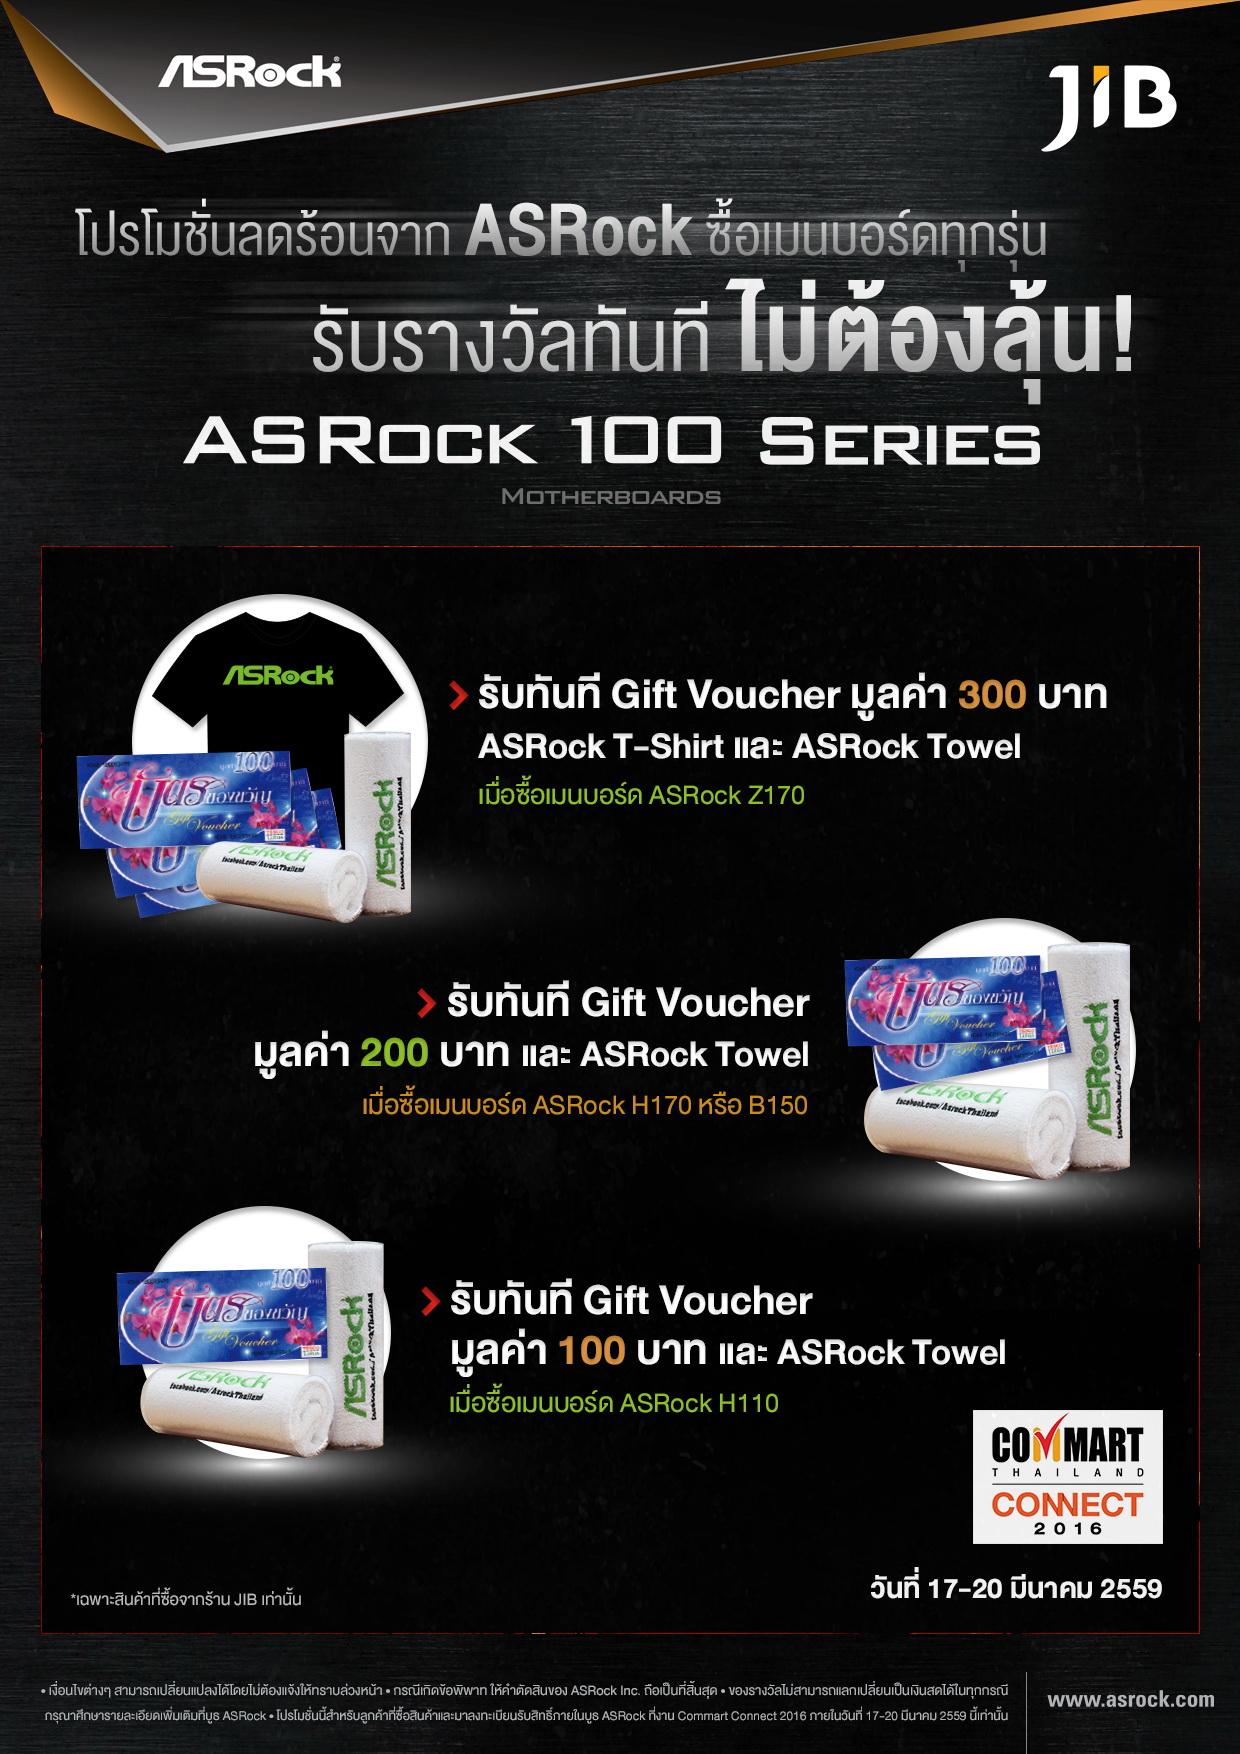 ASRock-JIB-promotion commart 2016